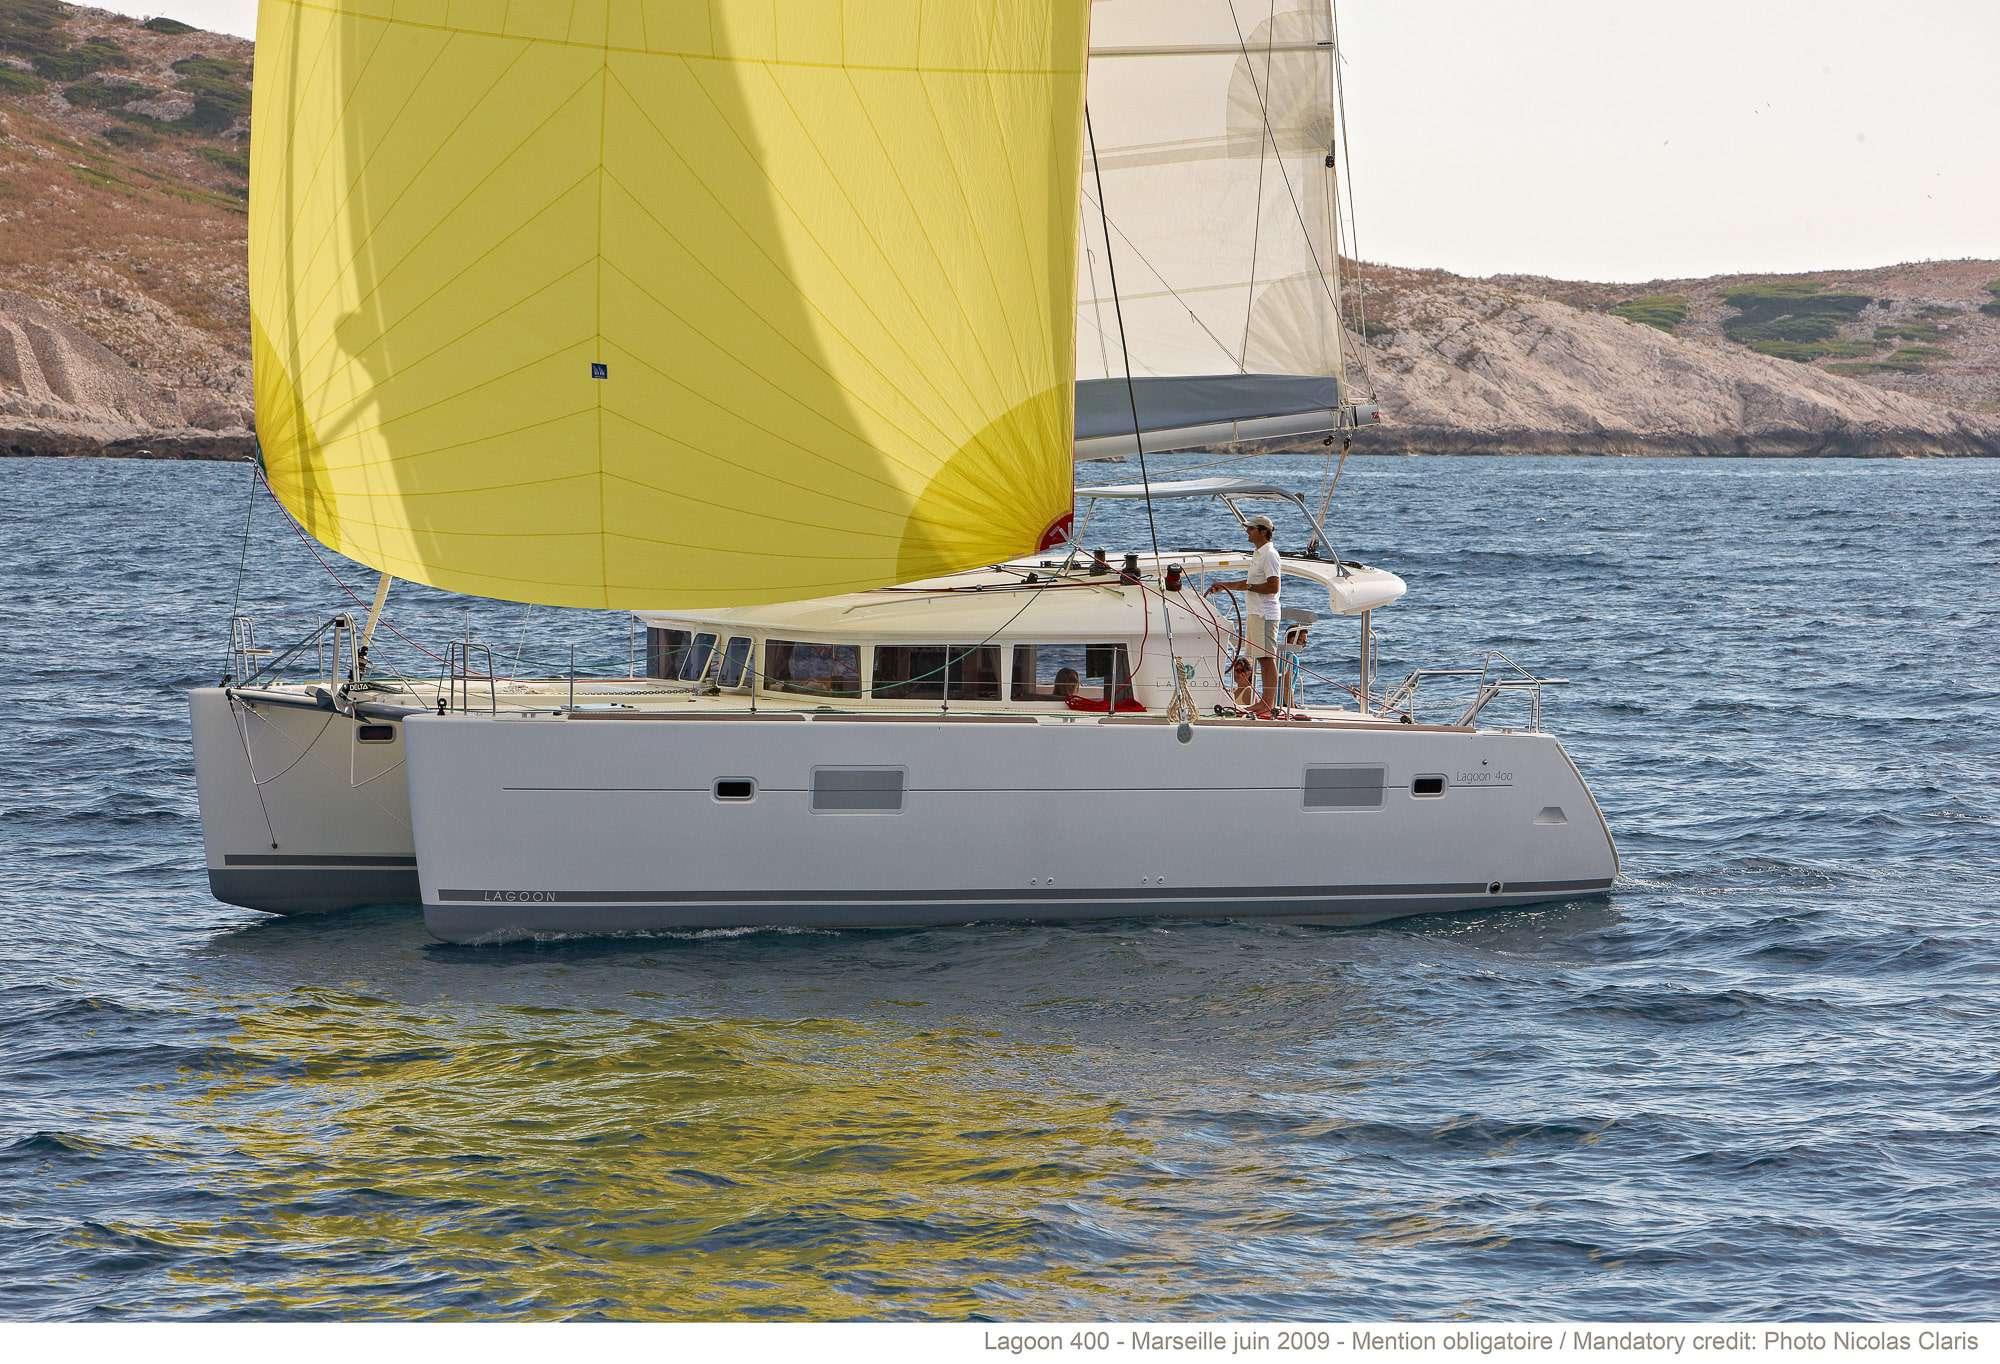 lagoon 400-yacht-charter-croatia-sailing-holidays-croatia-booking-yacht-charter-croatia-catamarans-sailboats-motorboats-gulets-luxury-yachts-boat-rental-croatia 7